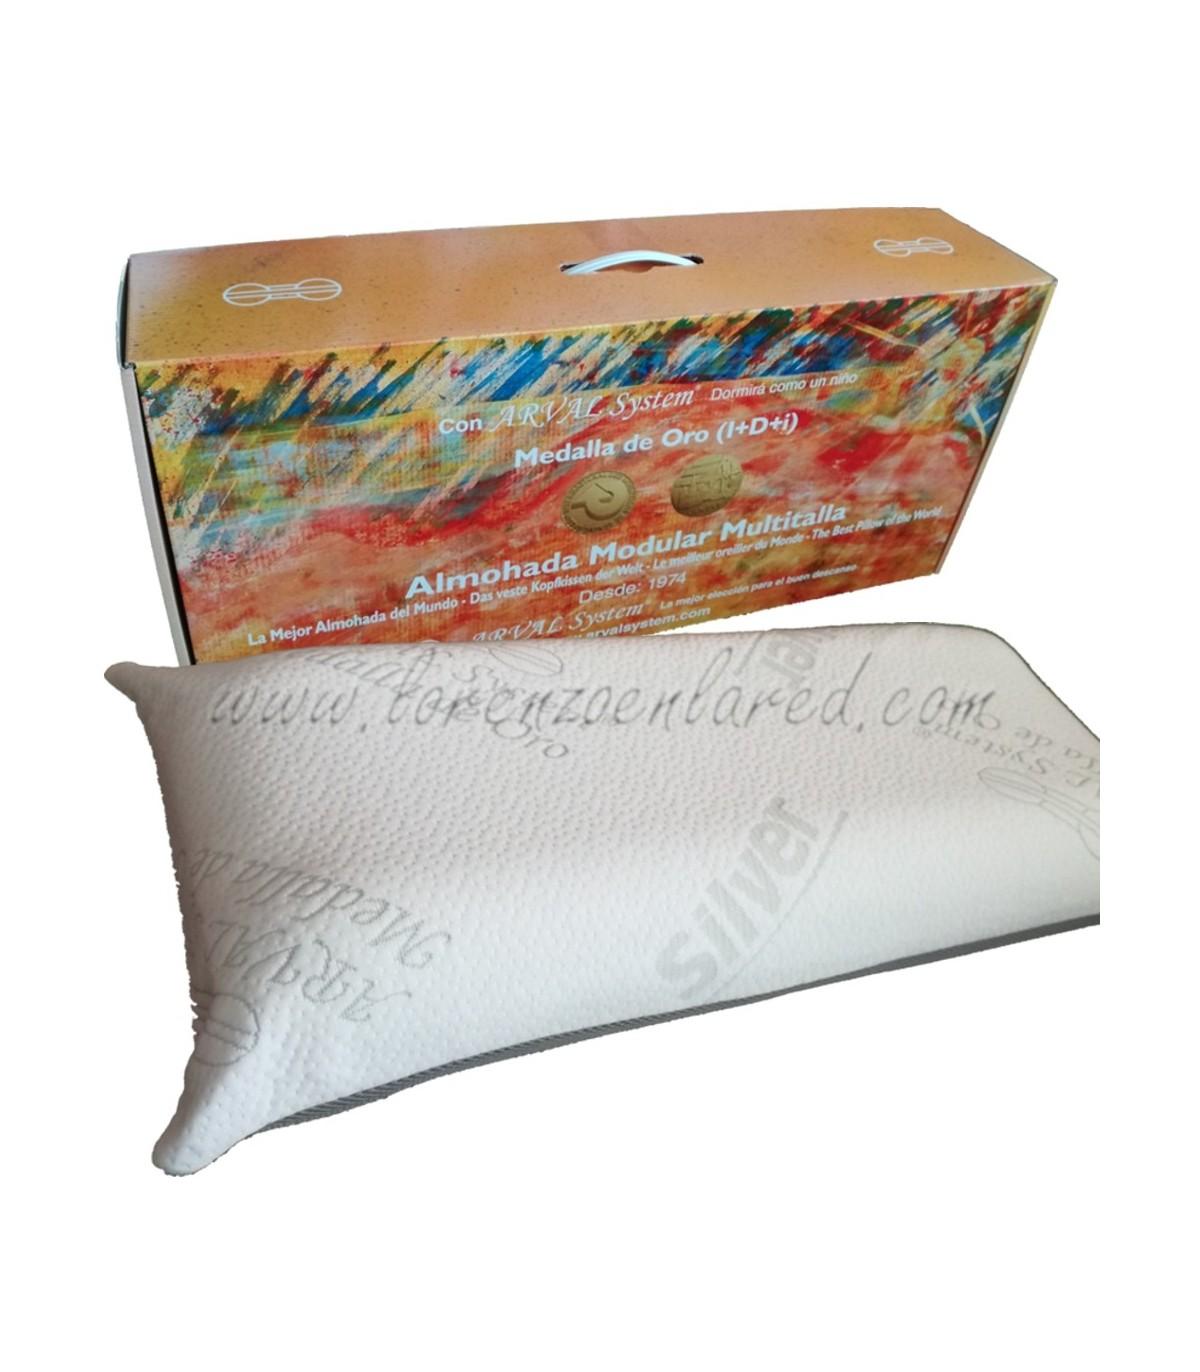 Almohada Modular Cervical Arval   Ronquidos, Tiendas de